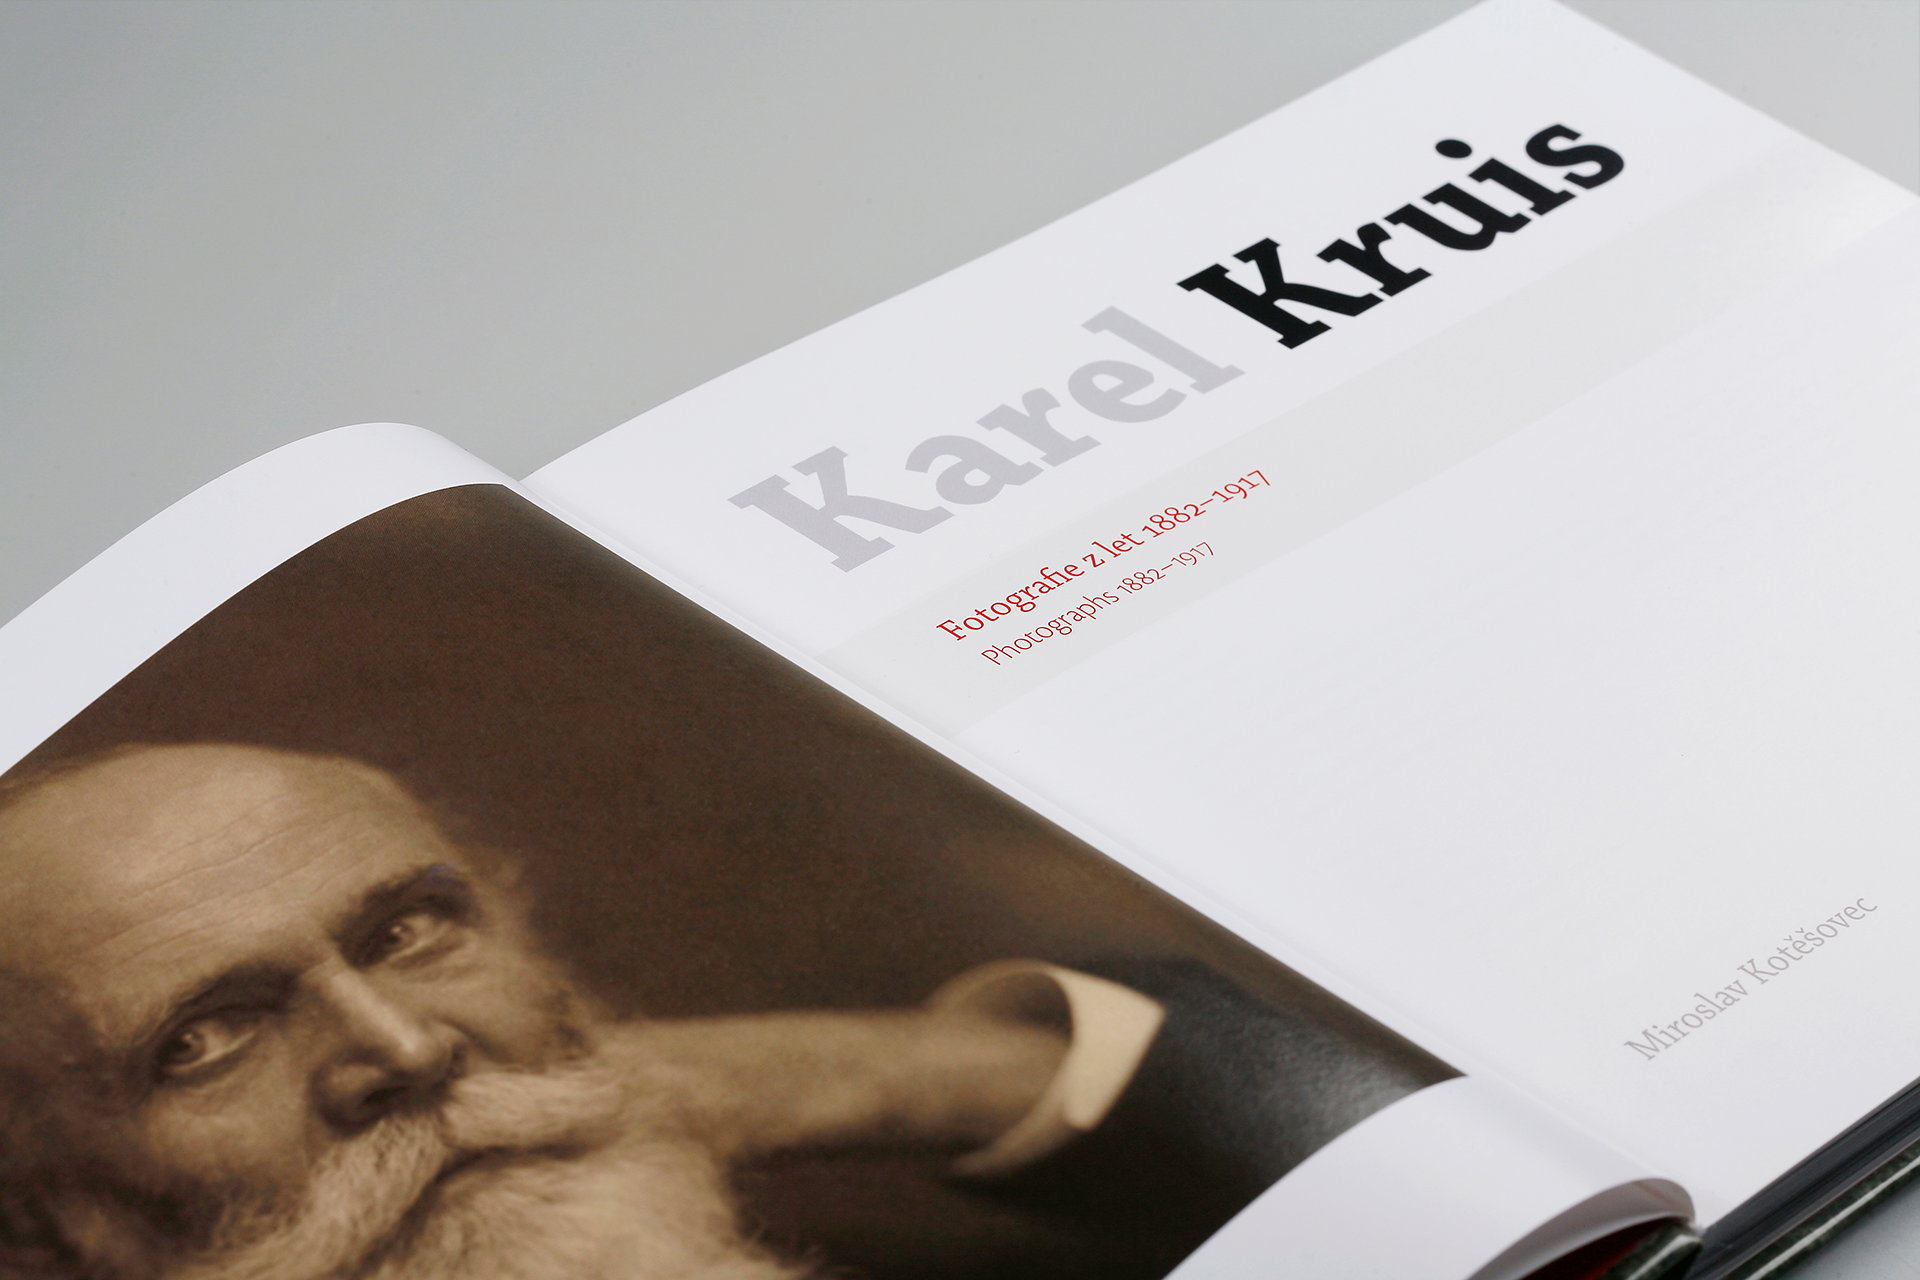 2007-Karel-Kruis-monografie-fotografa-MG_0071